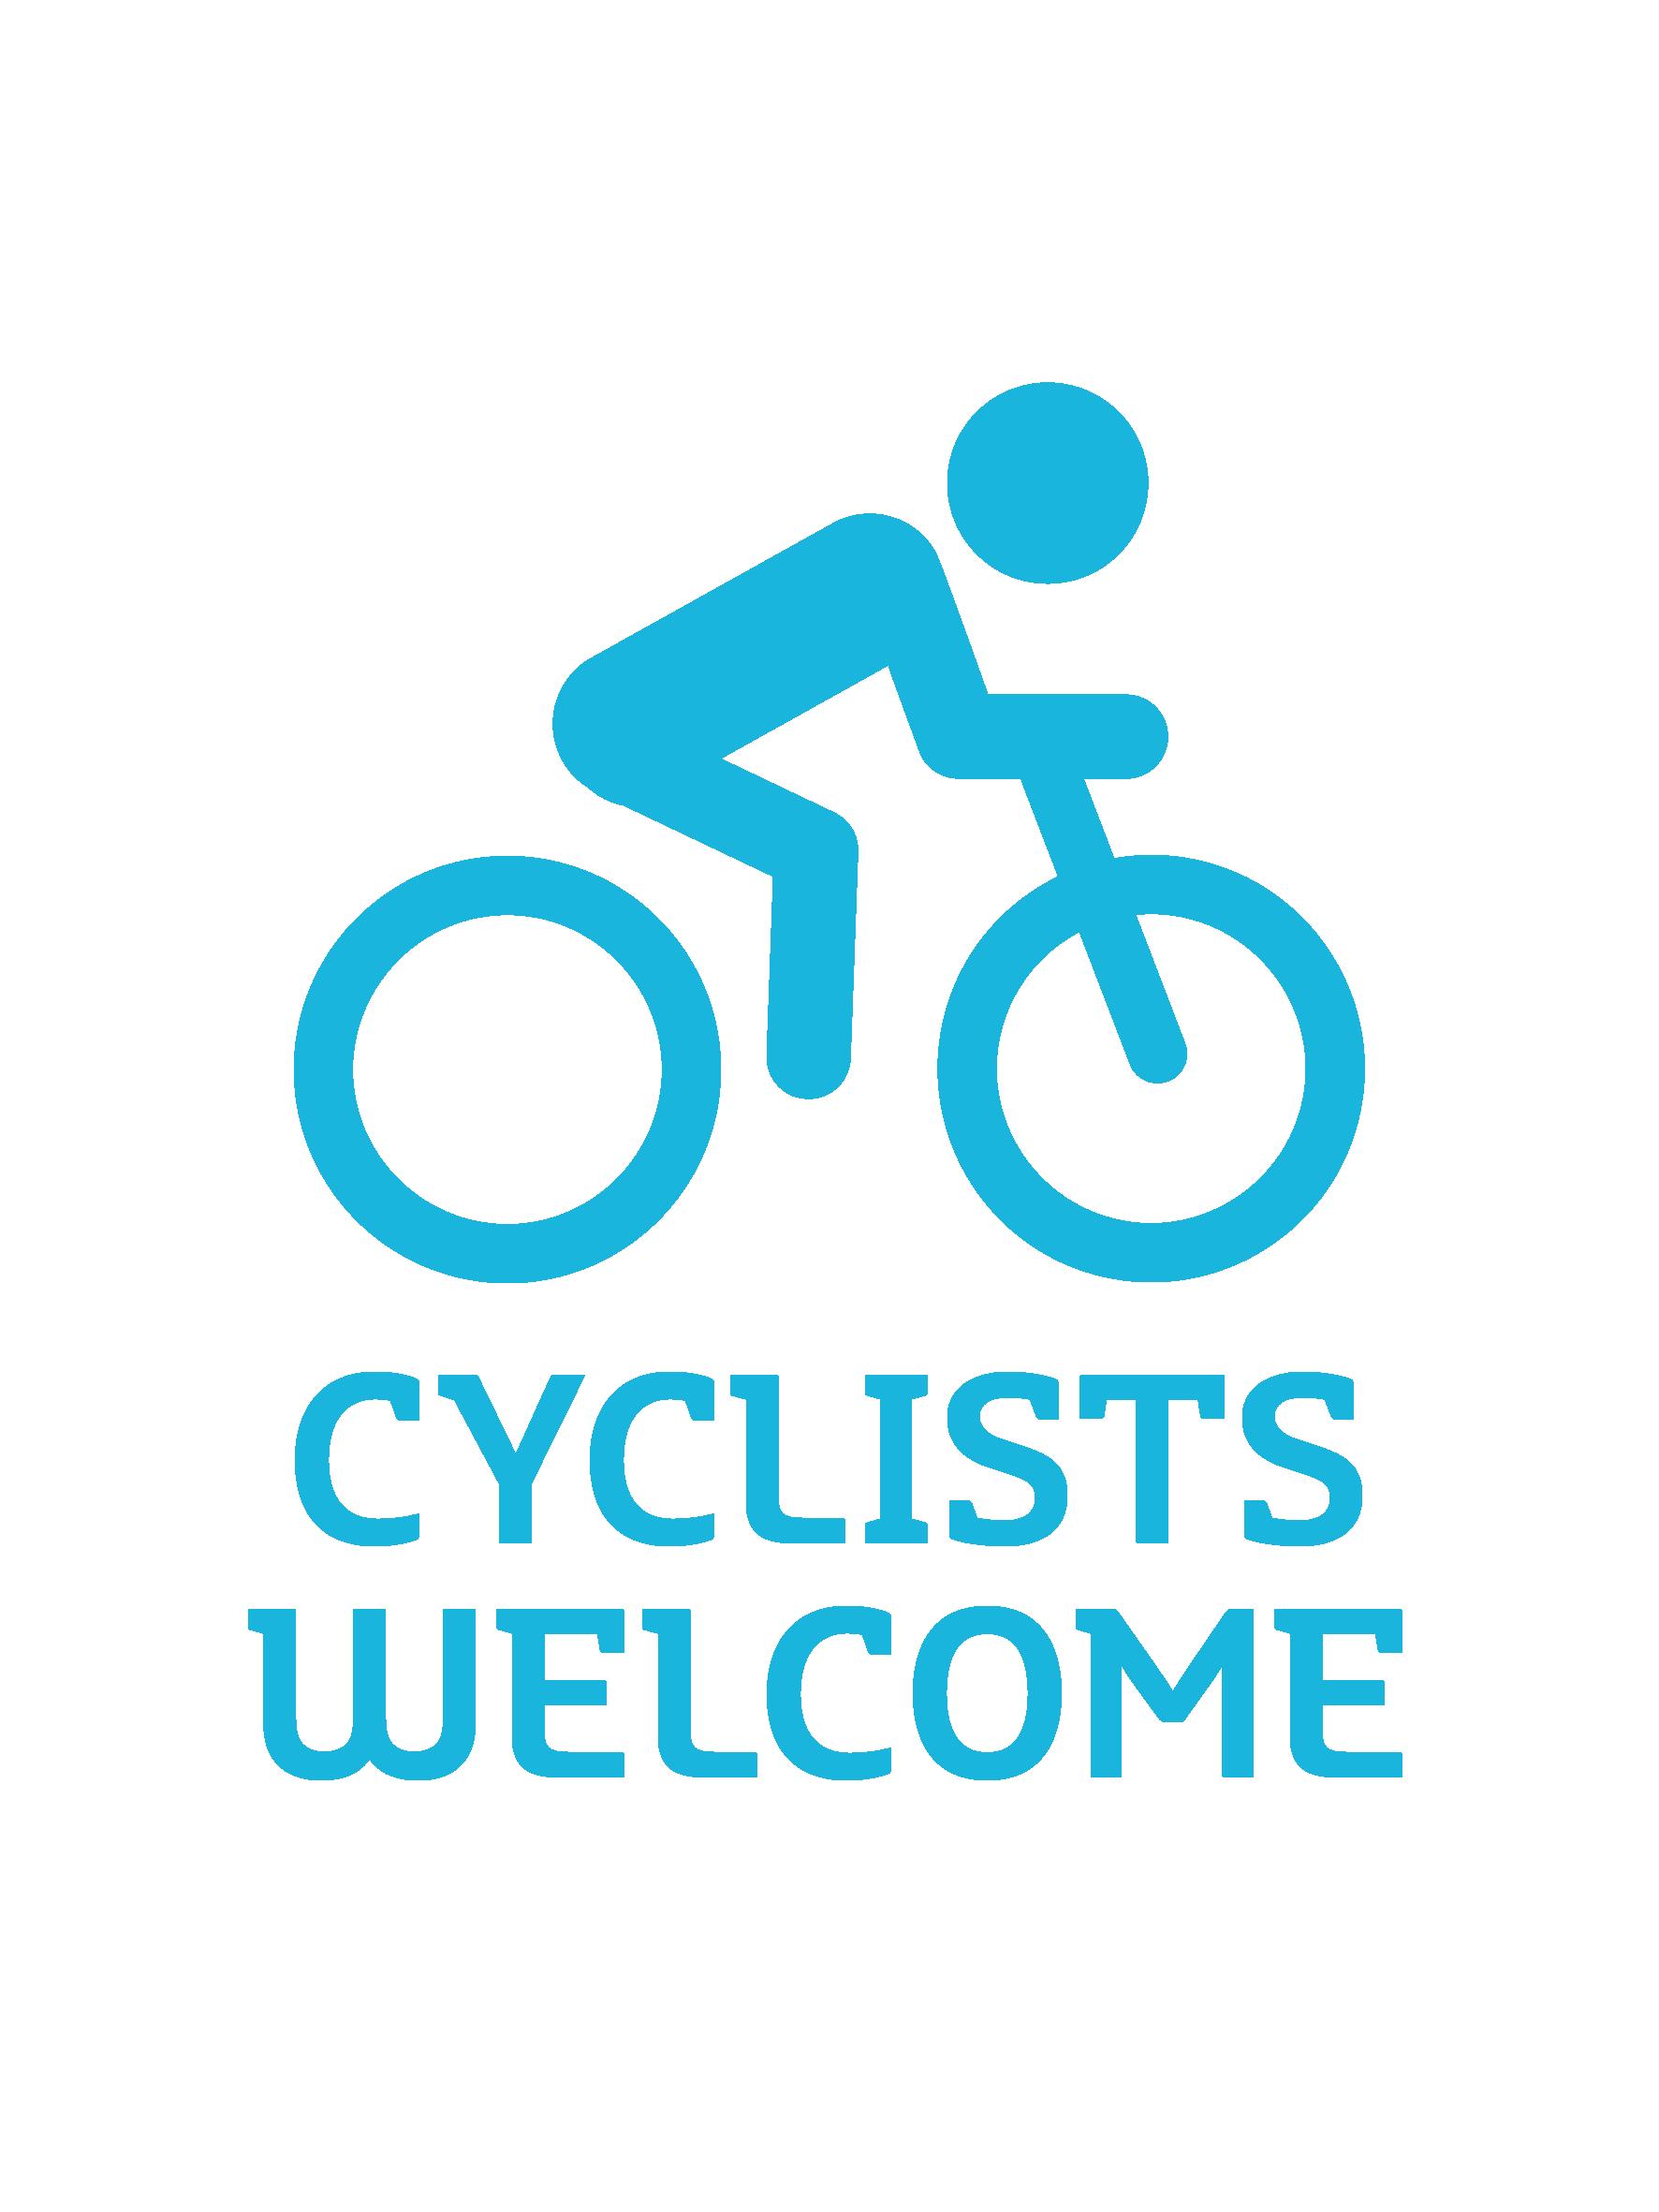 Cyclists welcome.jpg